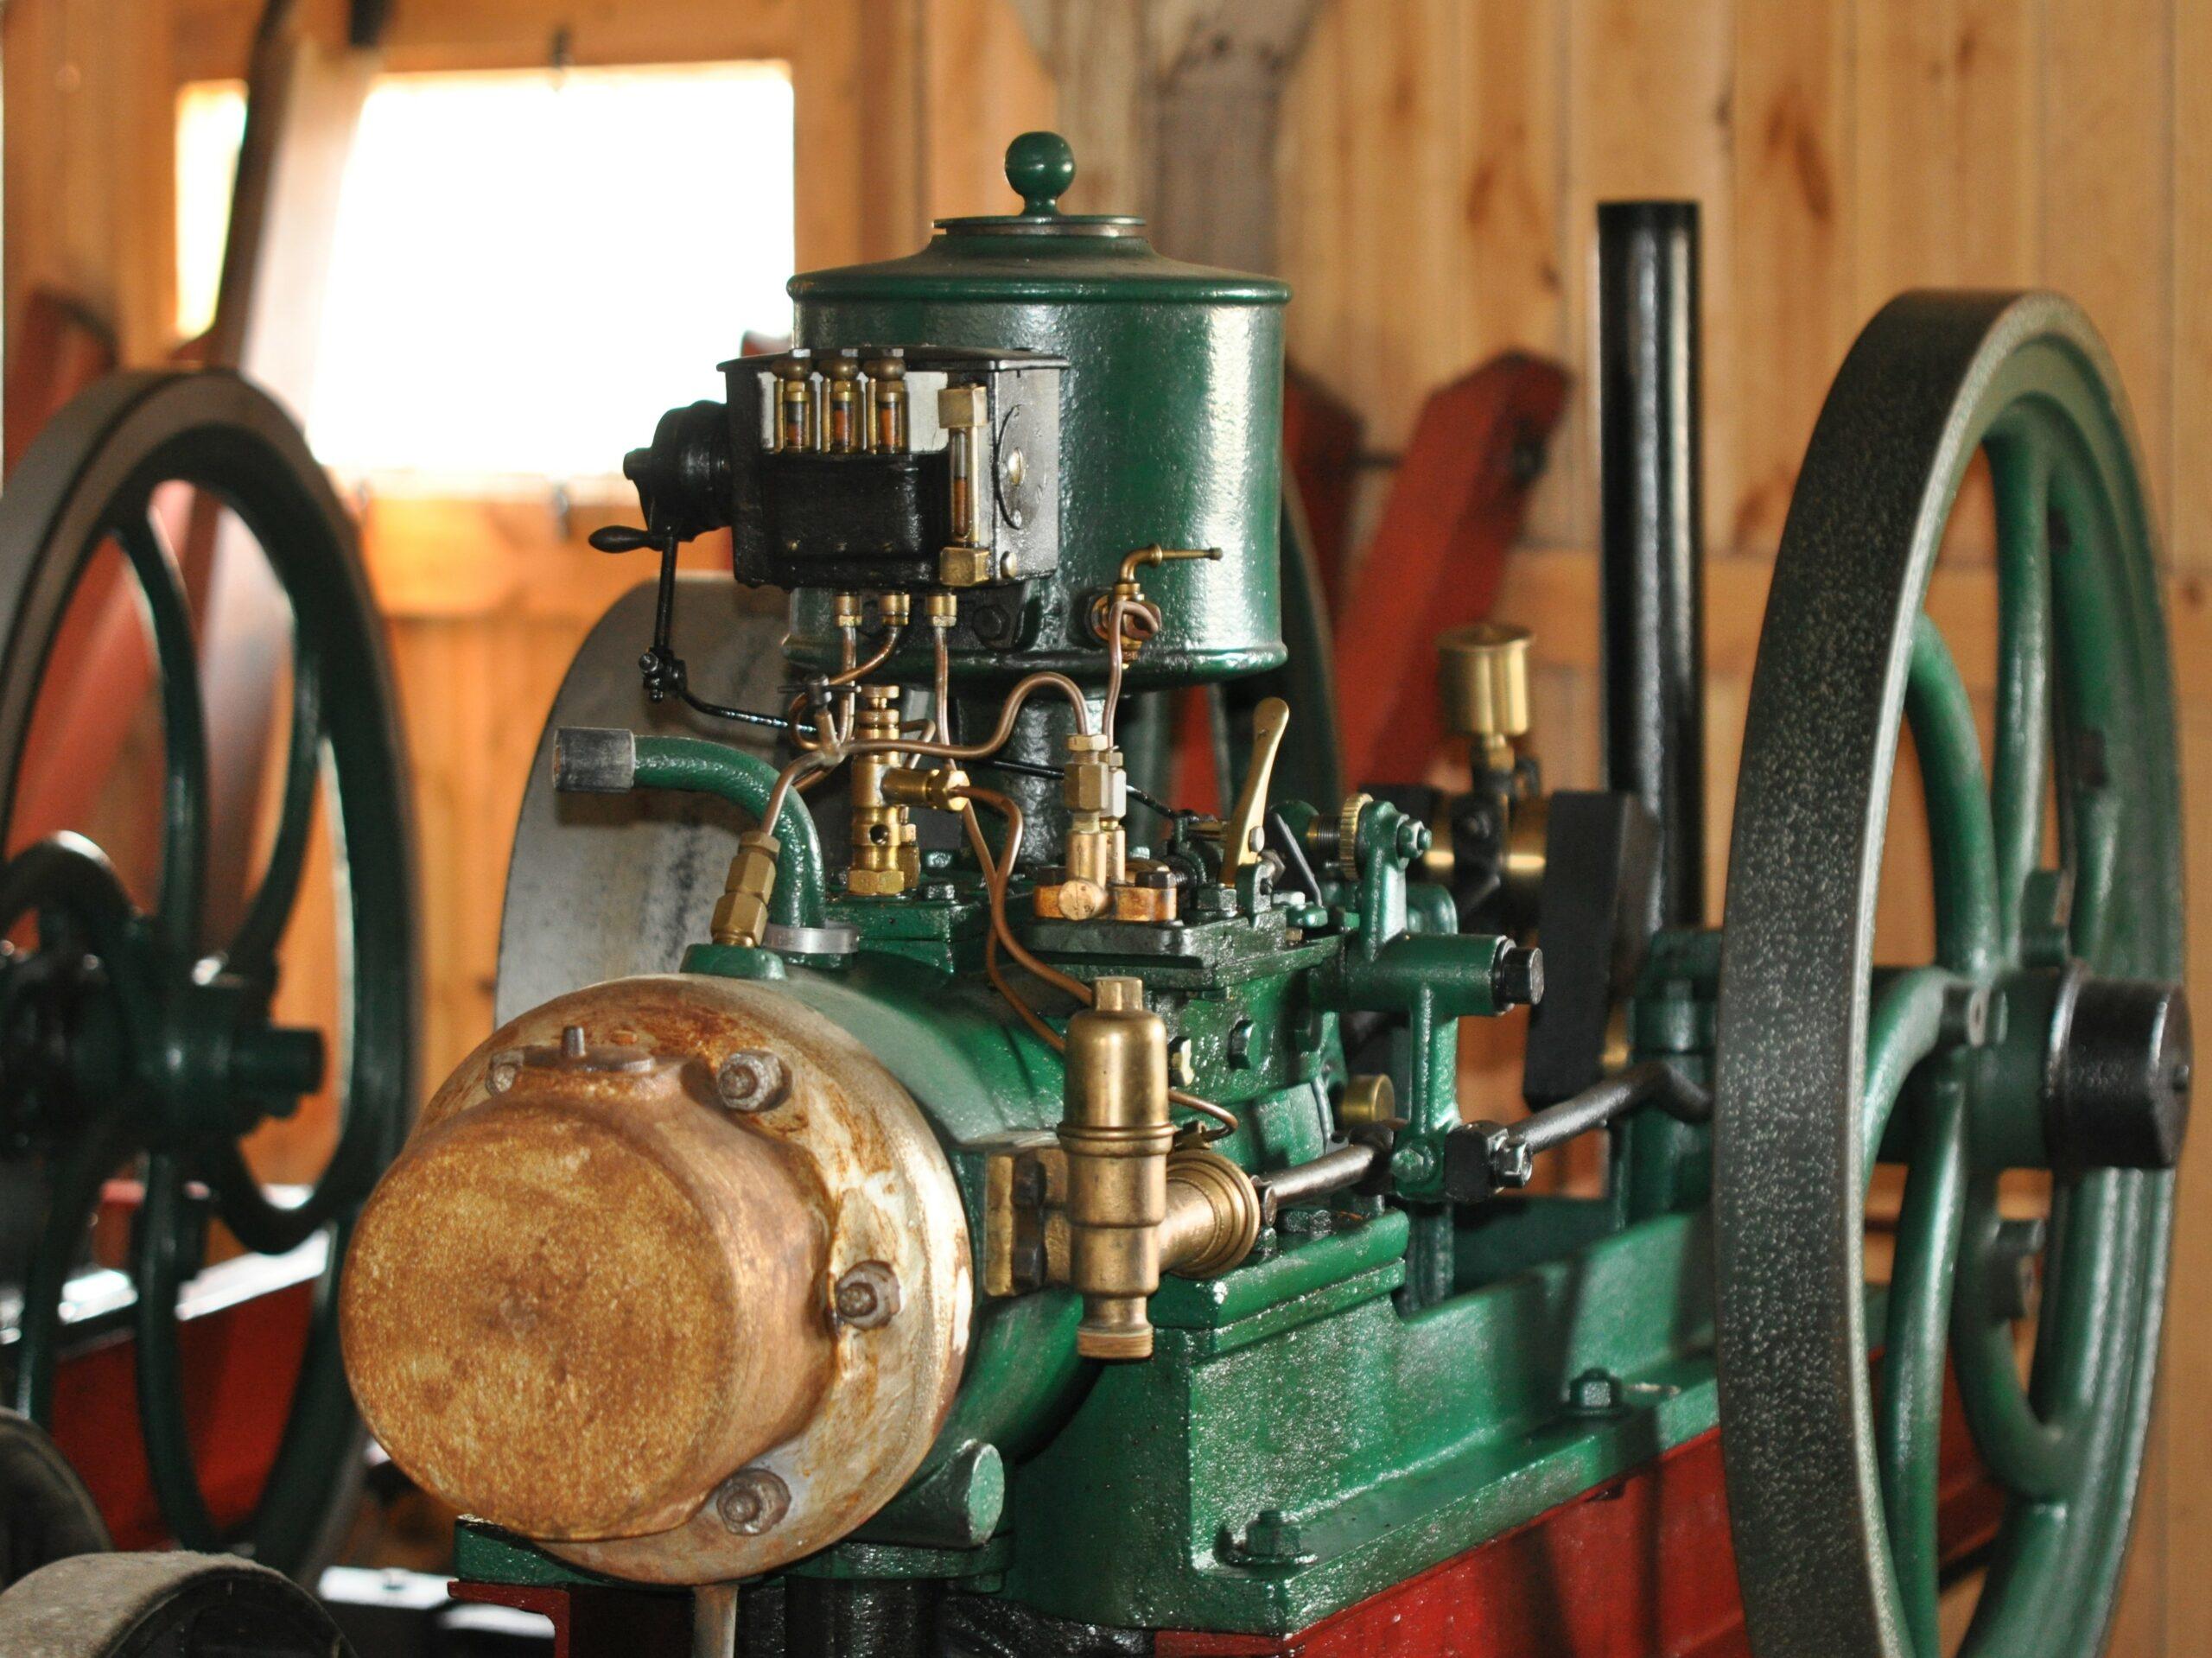 Motormuseum20120328 012 1 scaled